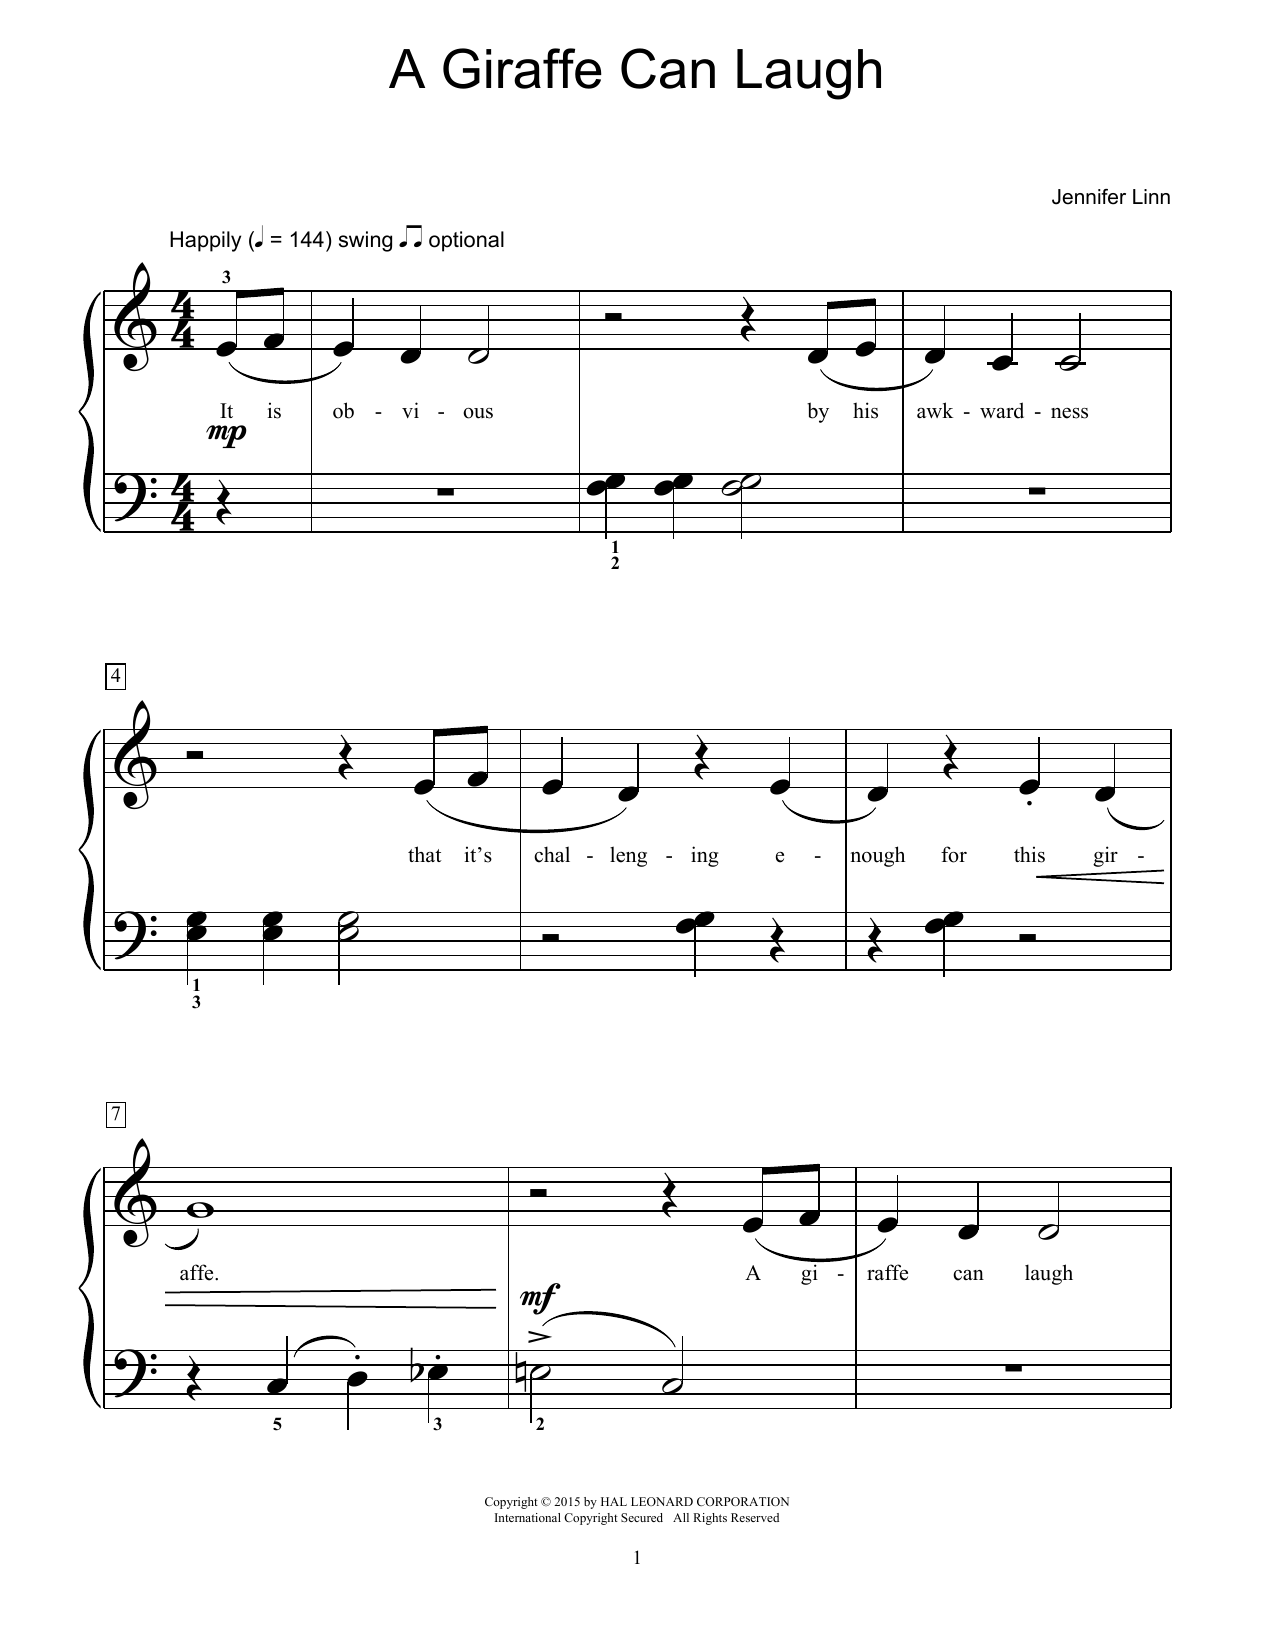 Jennifer Linn A Giraffe Can Laugh sheet music notes and chords. Download Printable PDF.